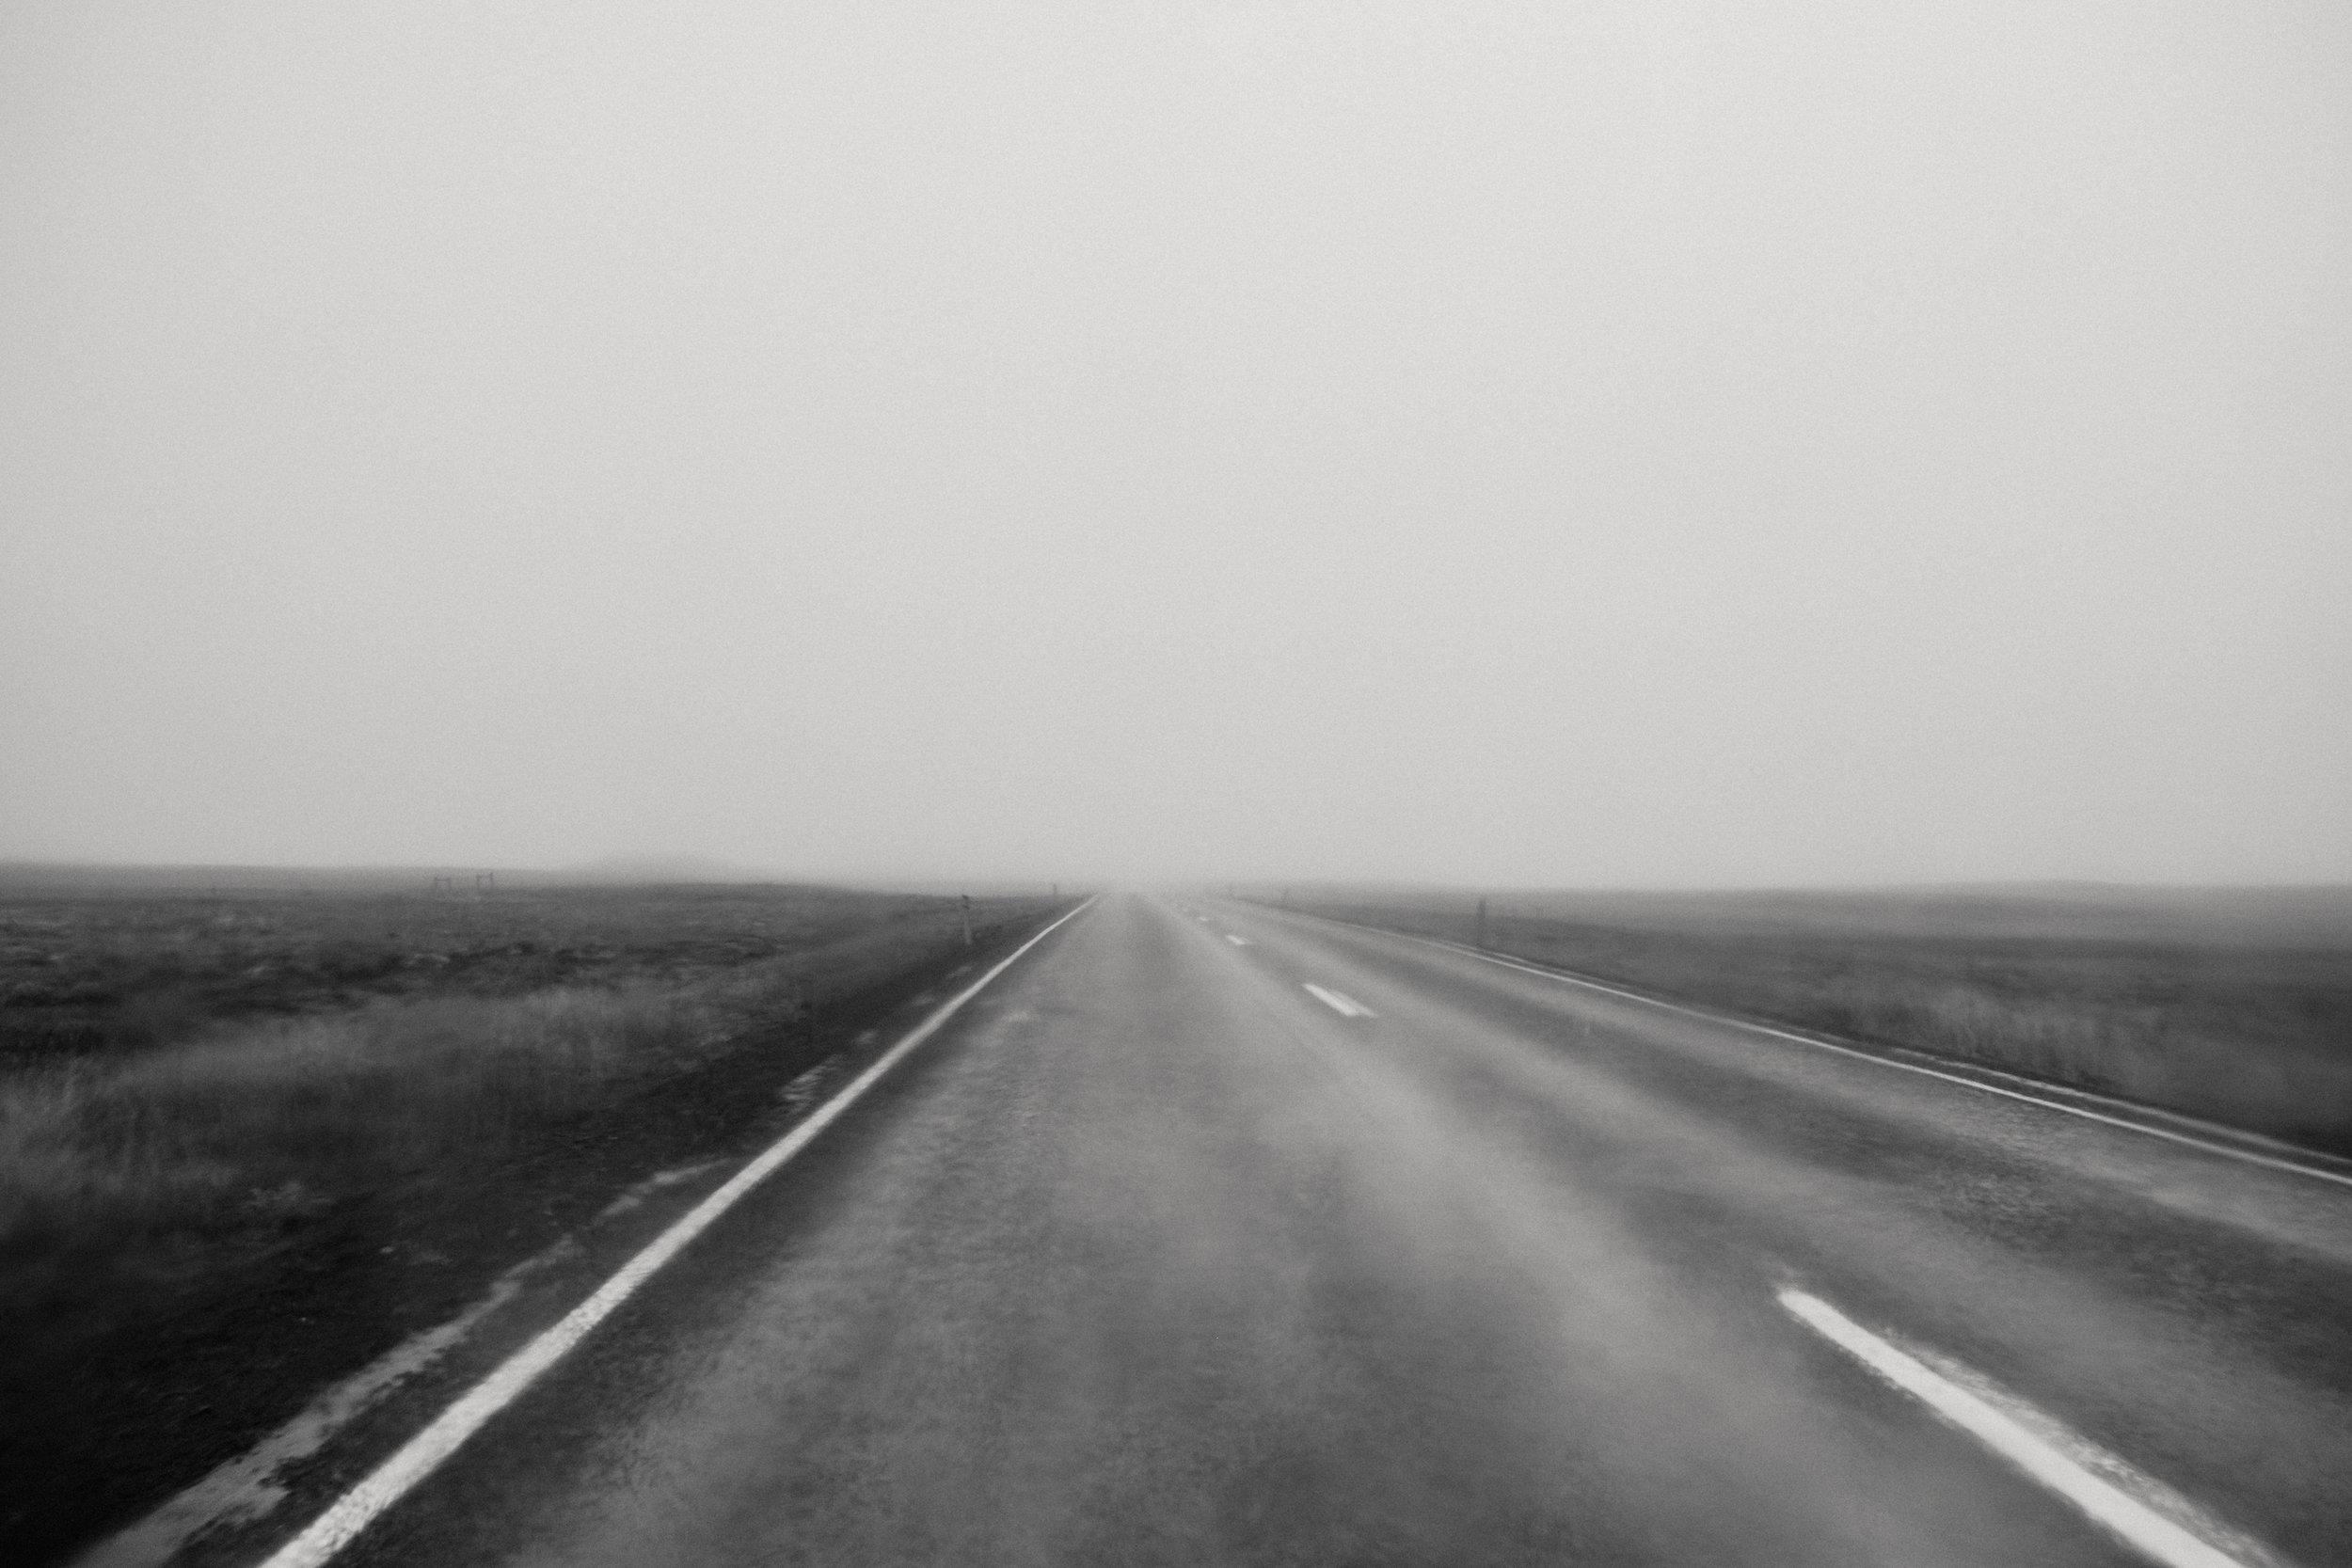 Northern-Iceland-2.jpg